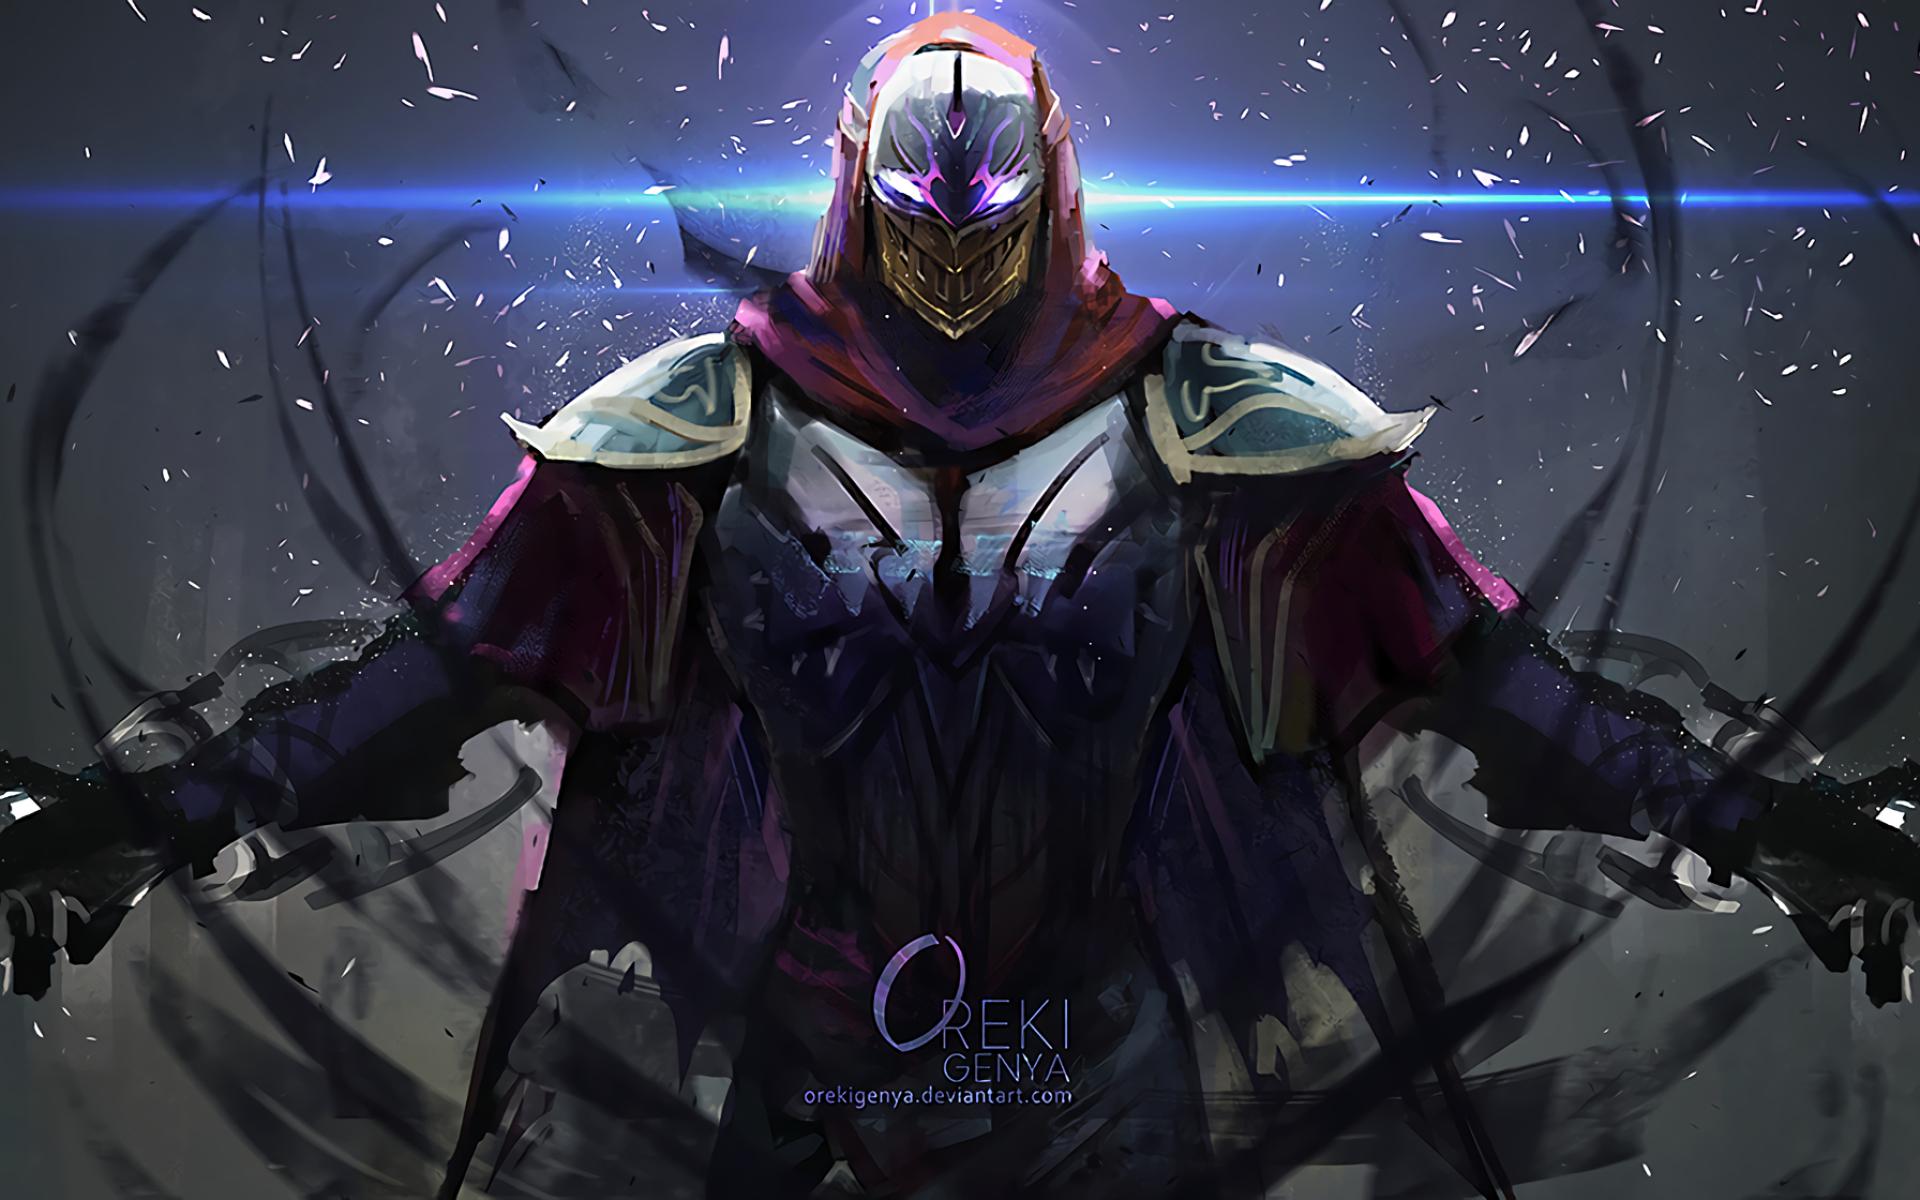 Zed League Of Legends Art Full Hd Wallpaper